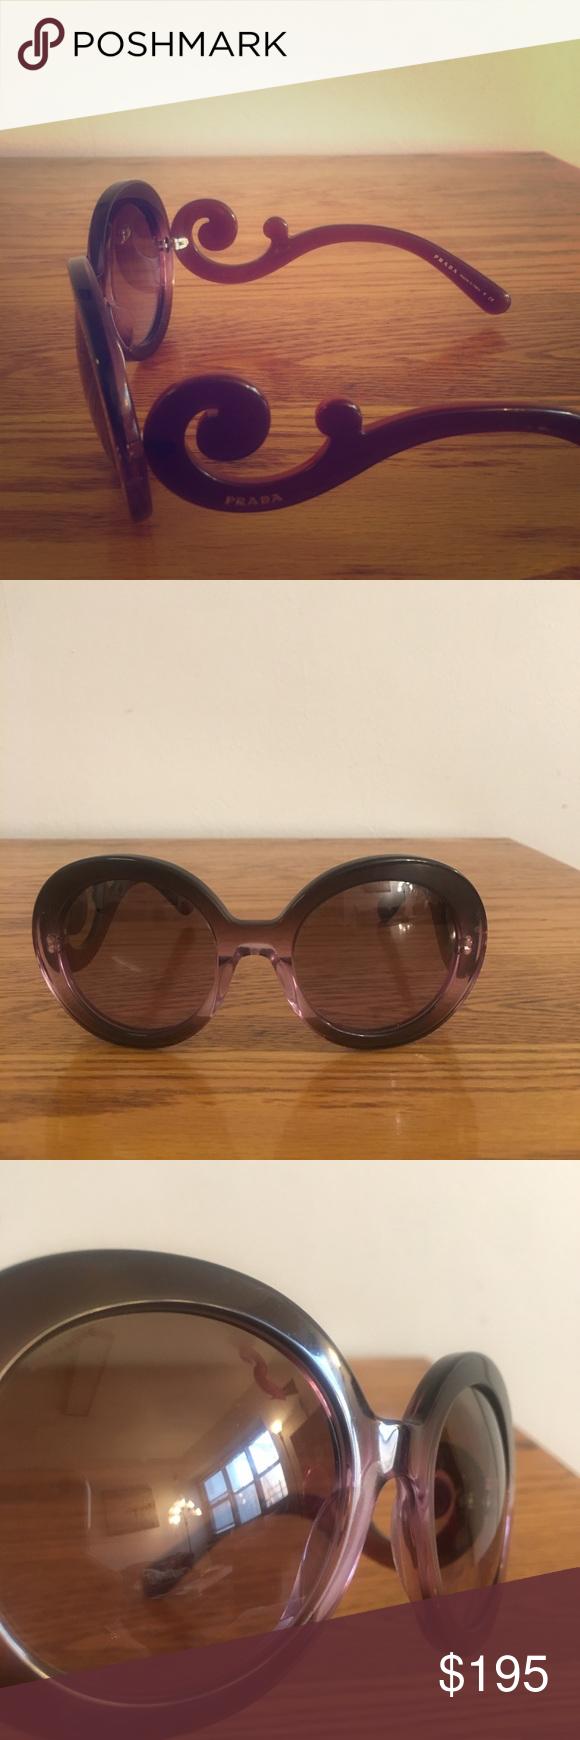 75f988a243e6 ... coupon prada baroque sunglasses these iconic prada baroque sunglasses  are in excellent condition. they are